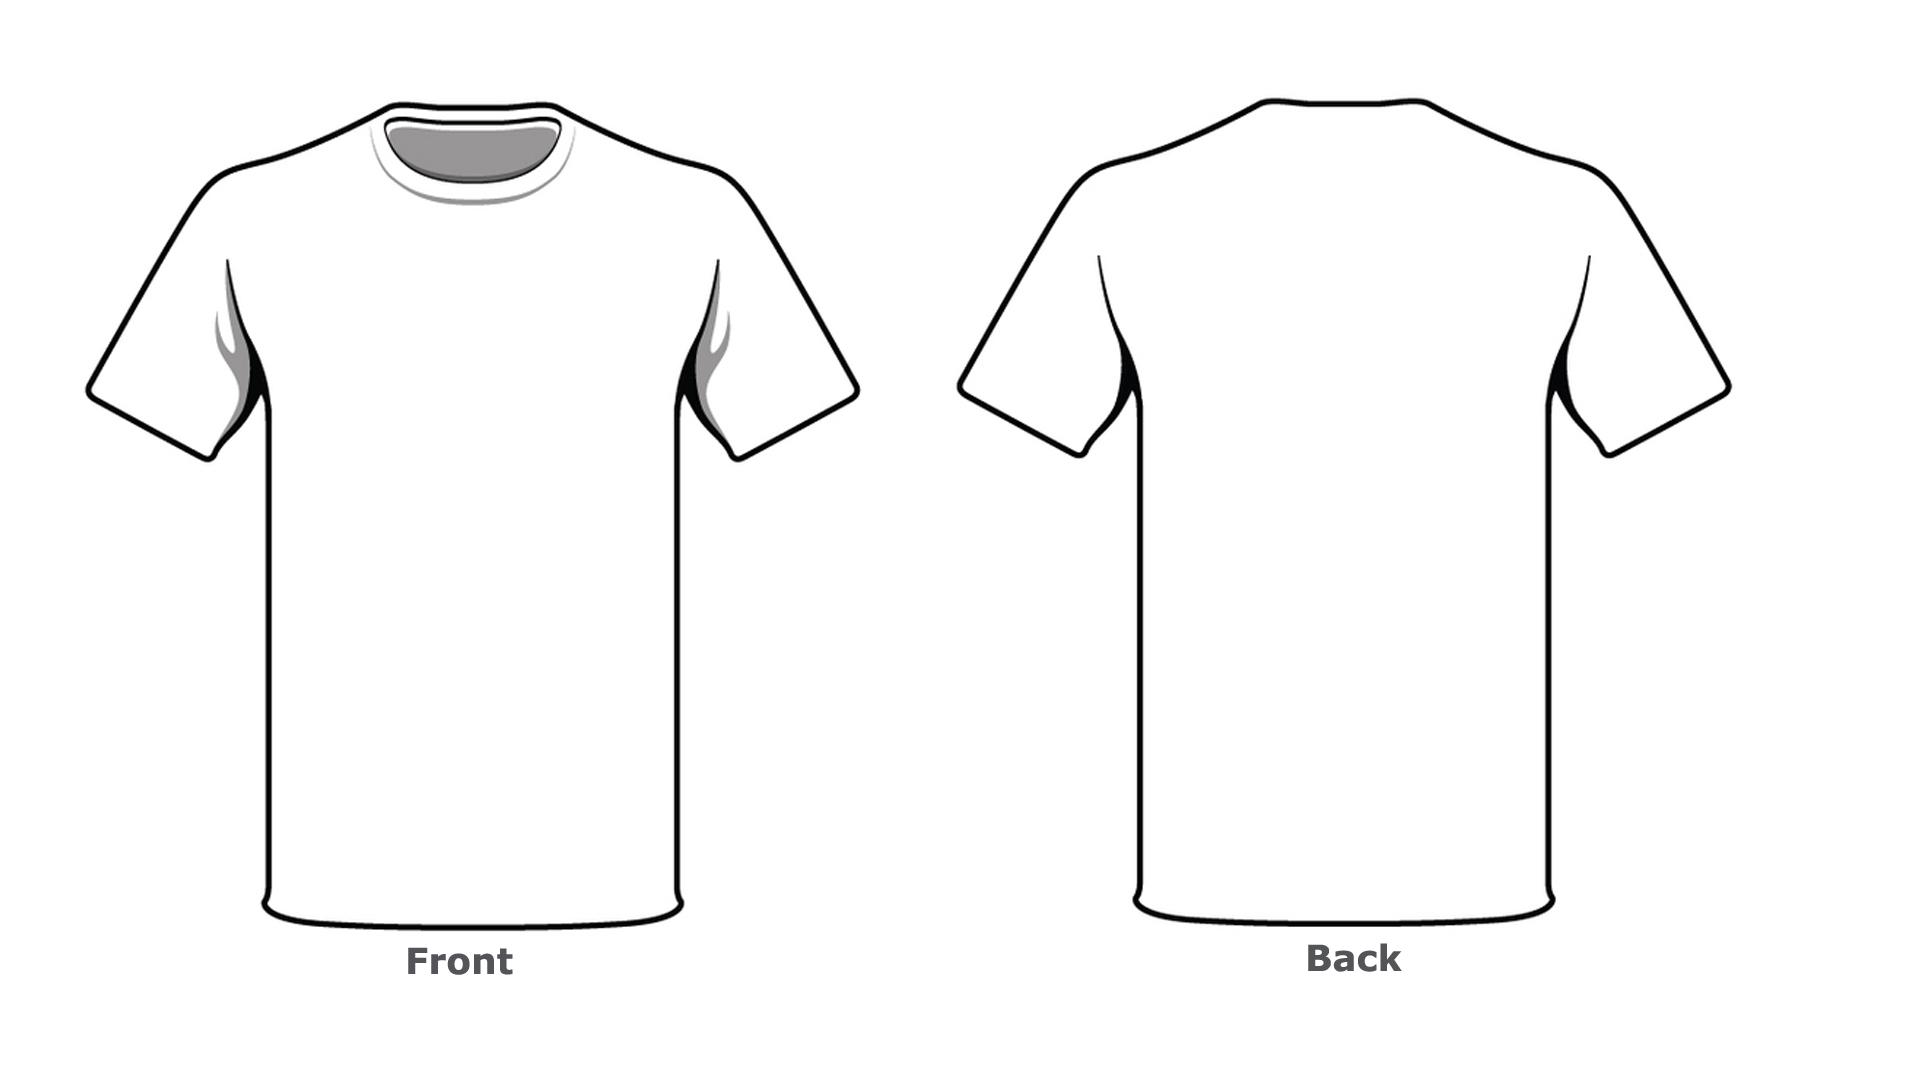 blank tshirt template front back side in high resolution. Black Bedroom Furniture Sets. Home Design Ideas